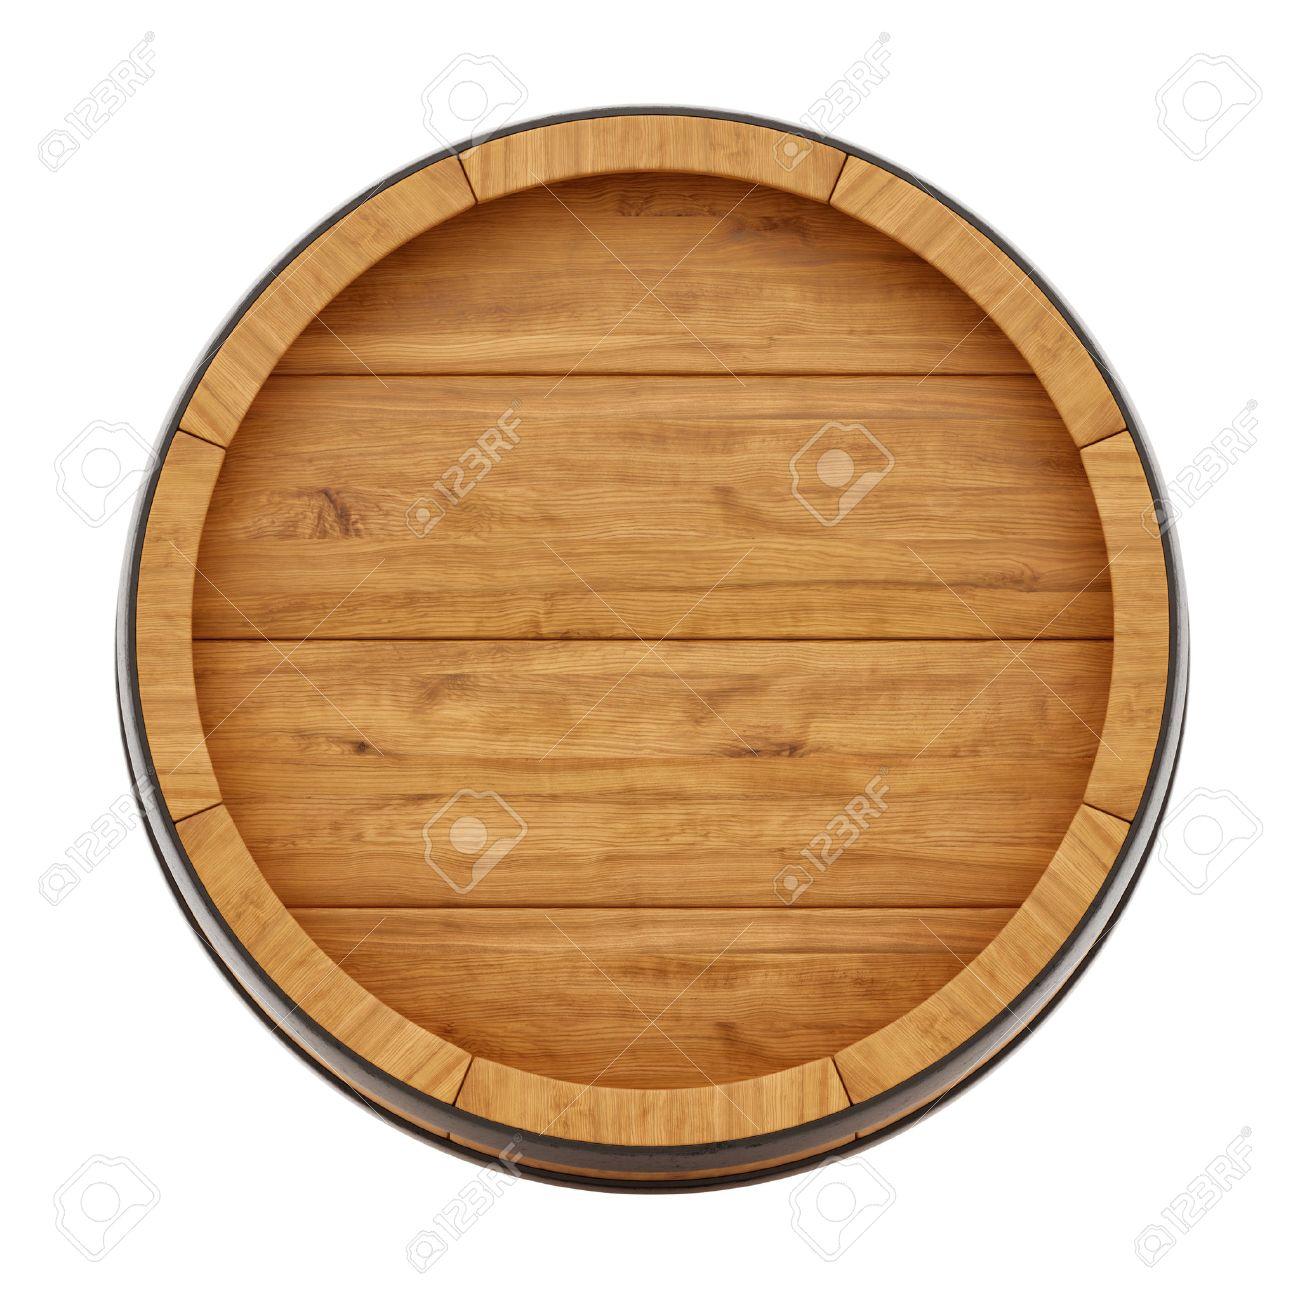 Wine Barrel Pictures